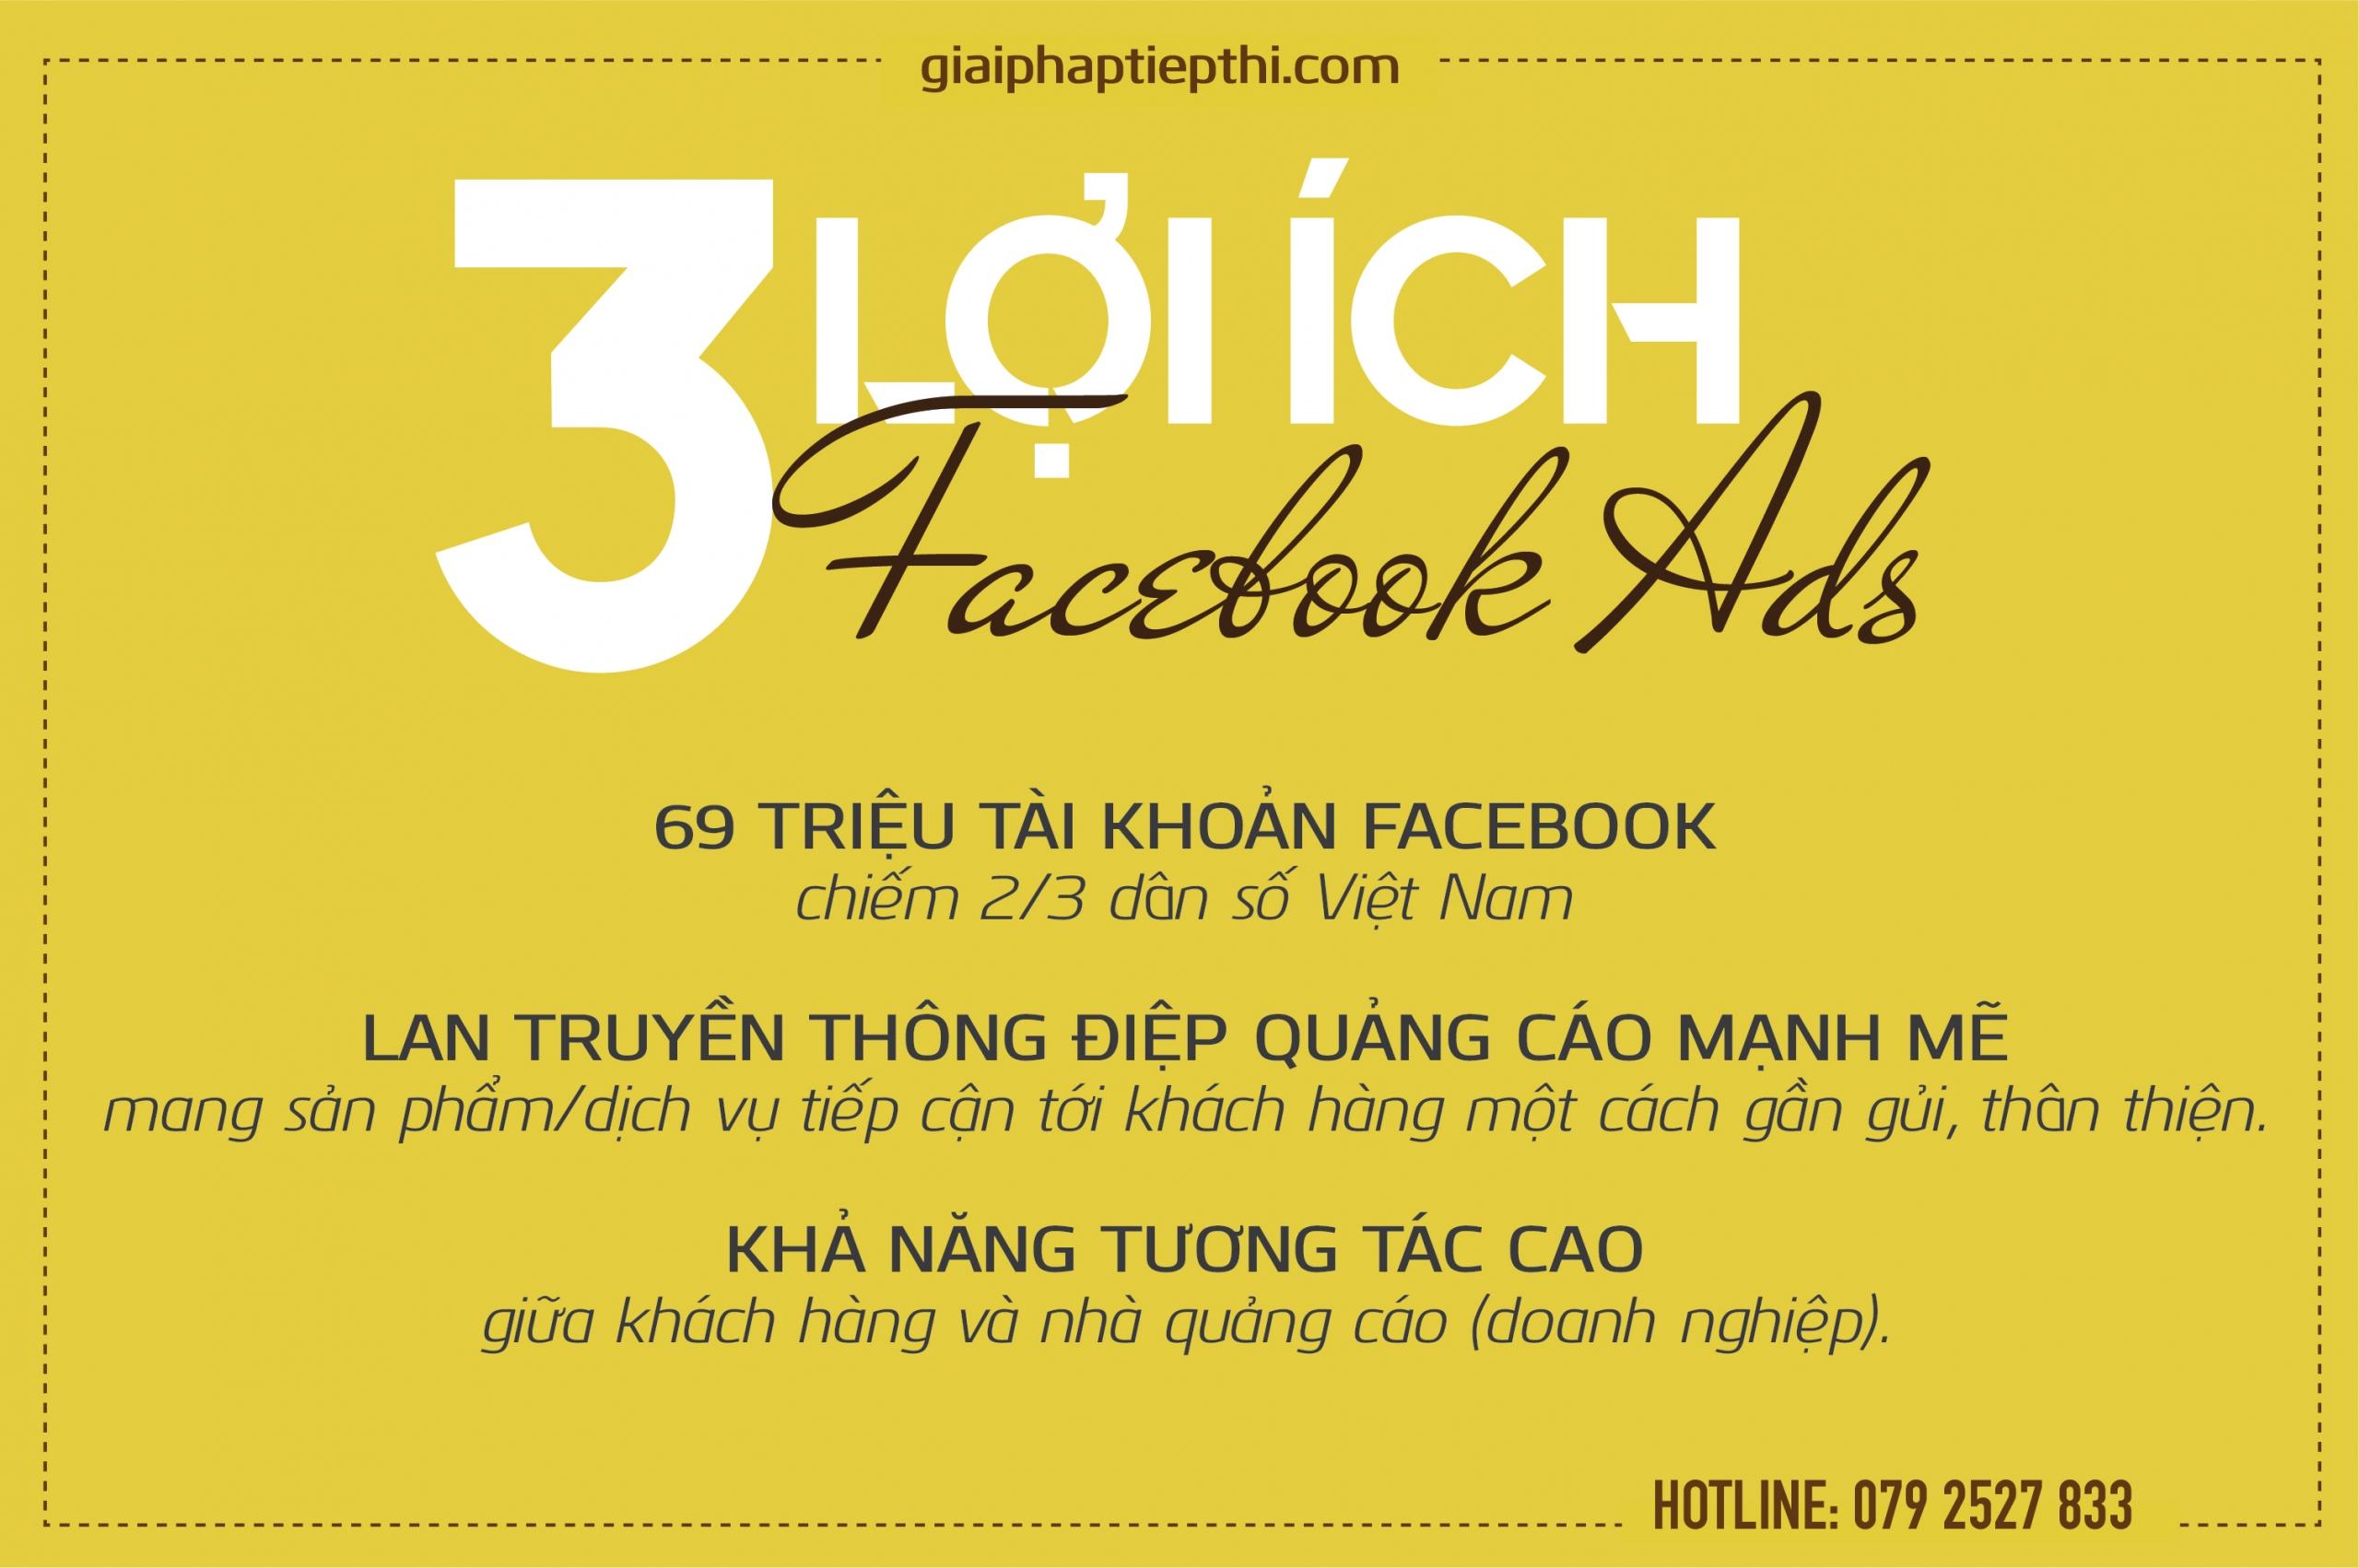 3-loi-ich-quang-cao-facebook